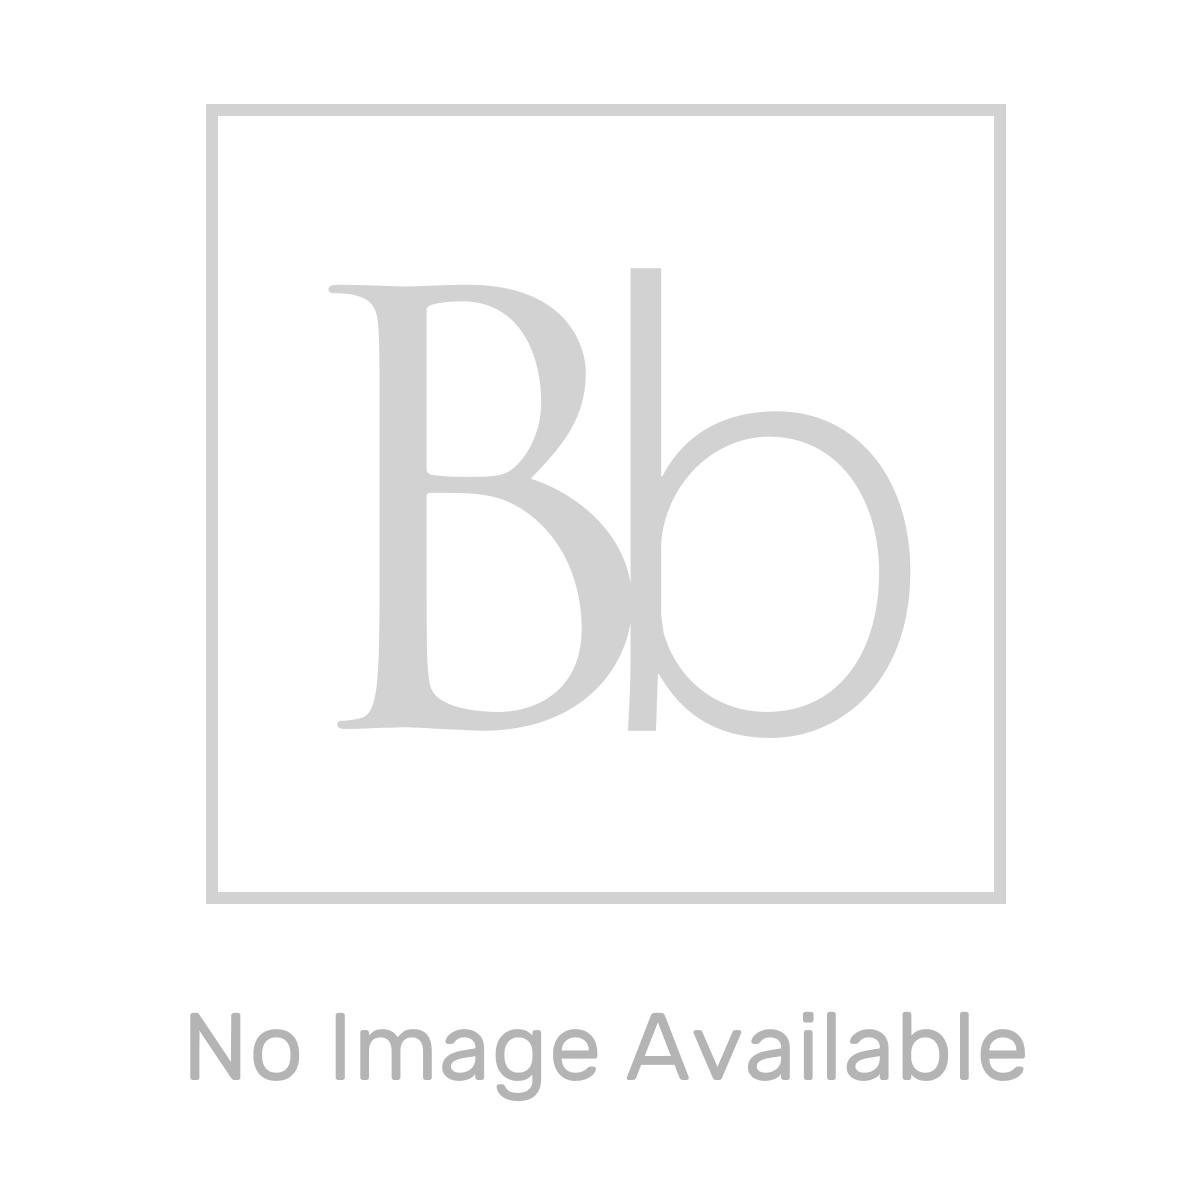 RAK Washington White Freestanding Bath 1560mm Measurements